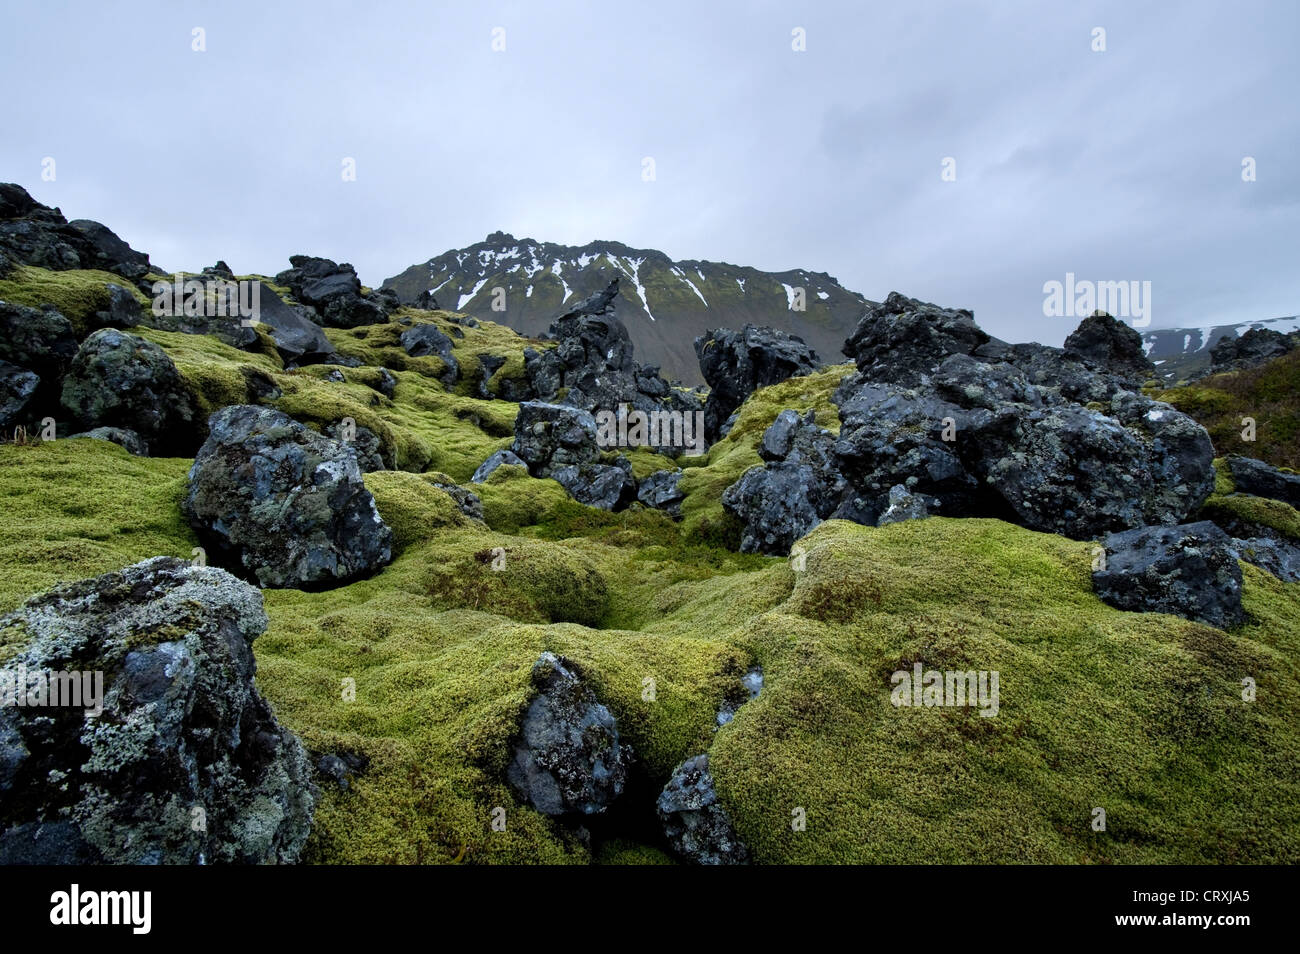 Lava fields, Snaefellsnes Peninsula, Iceland, Polar Regions - Stock Image